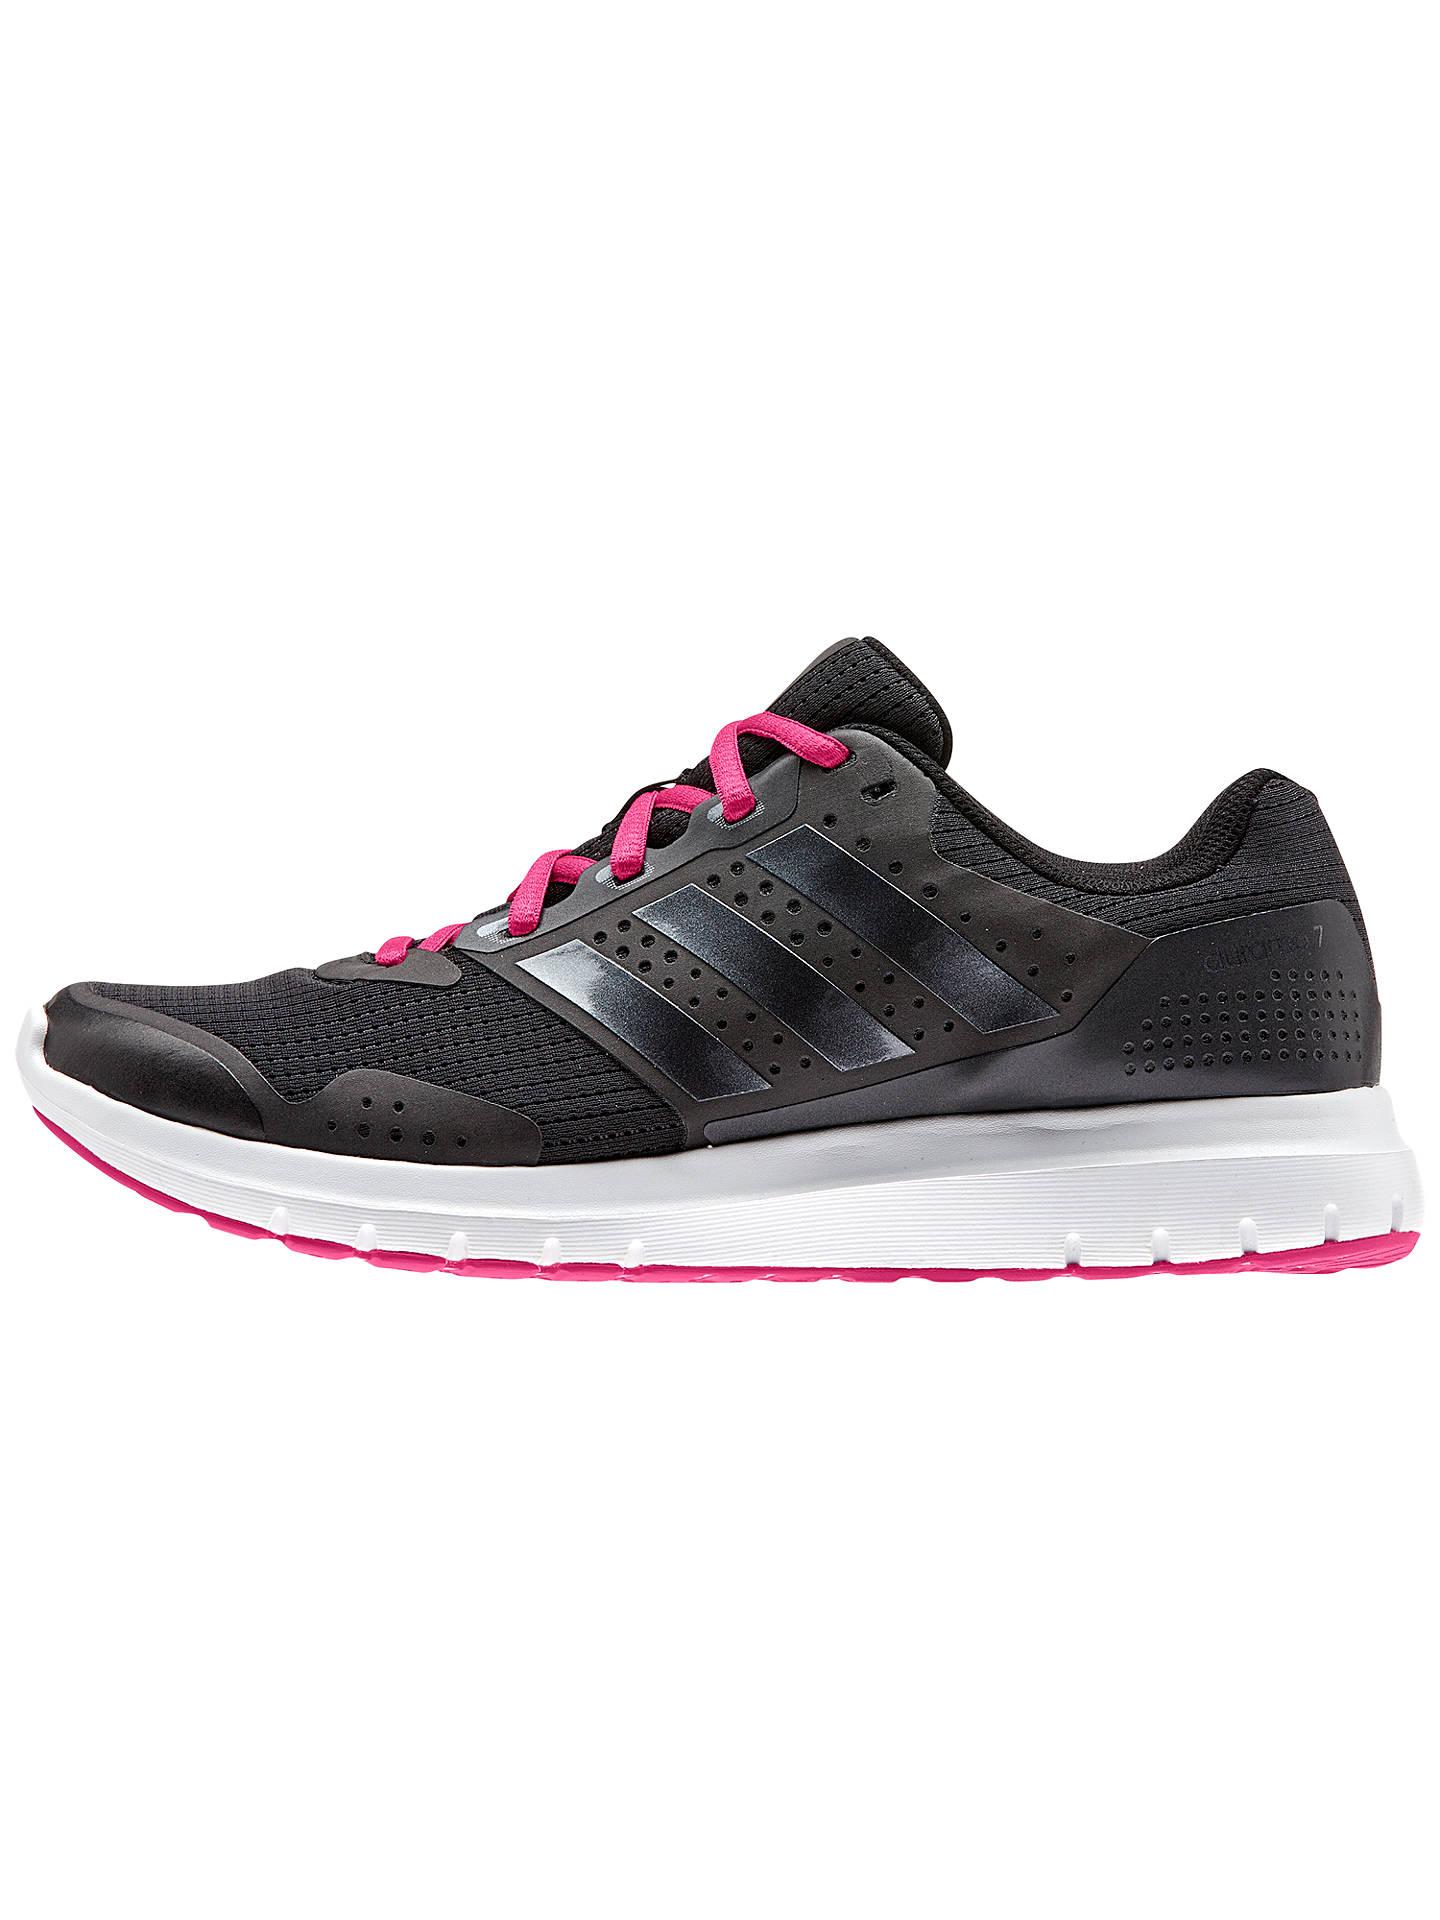 hot sale online 9f42b 5ed01 Buy Adidas Duramo 7 Women s Running Shoes, Black Pink, 4 Online at  johnlewis ...